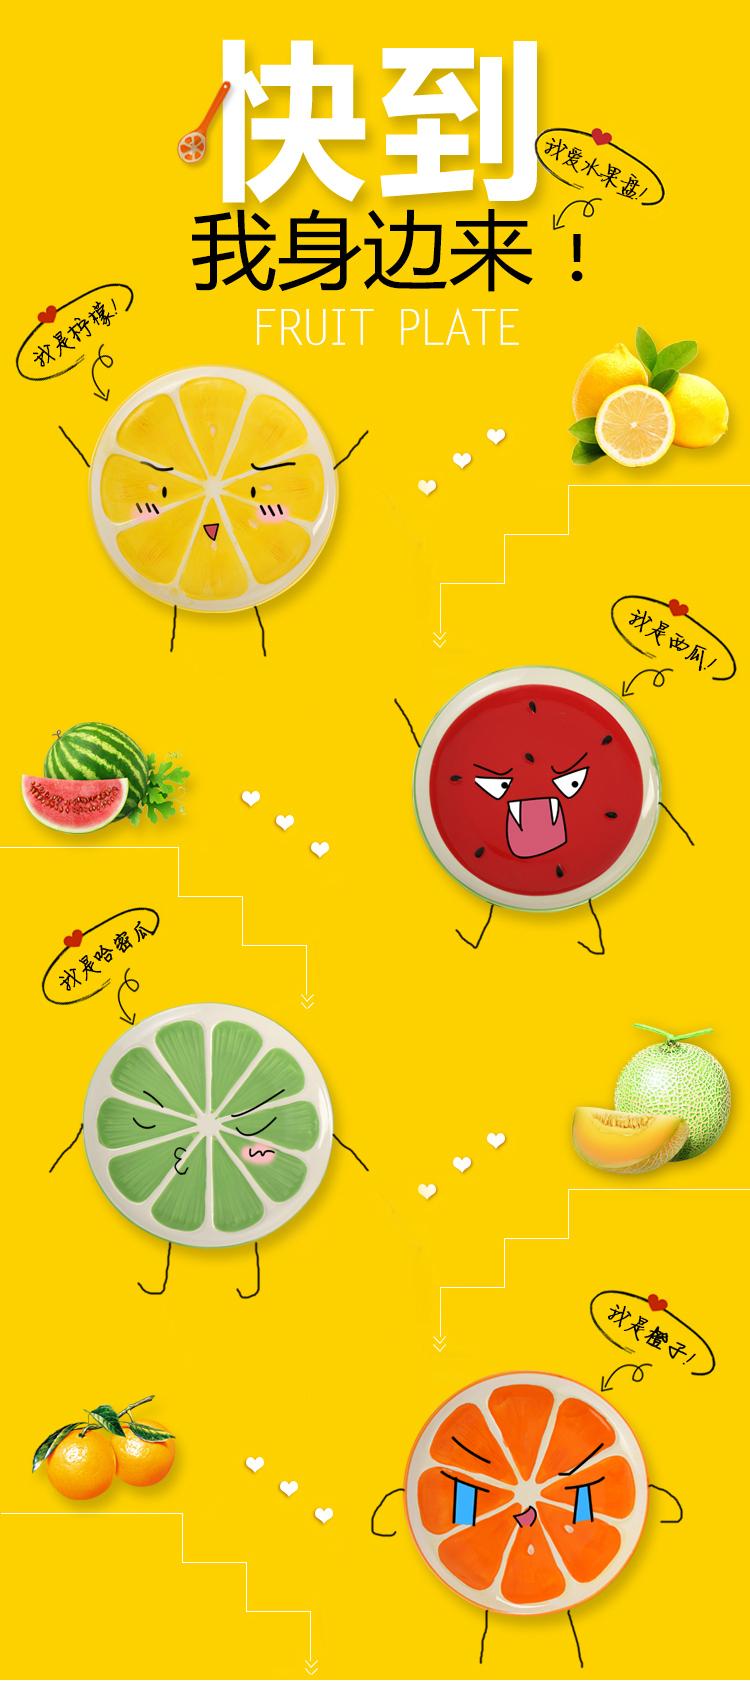 homee 创意手绘水果系列餐具套装 西瓜【价格 特卖 %